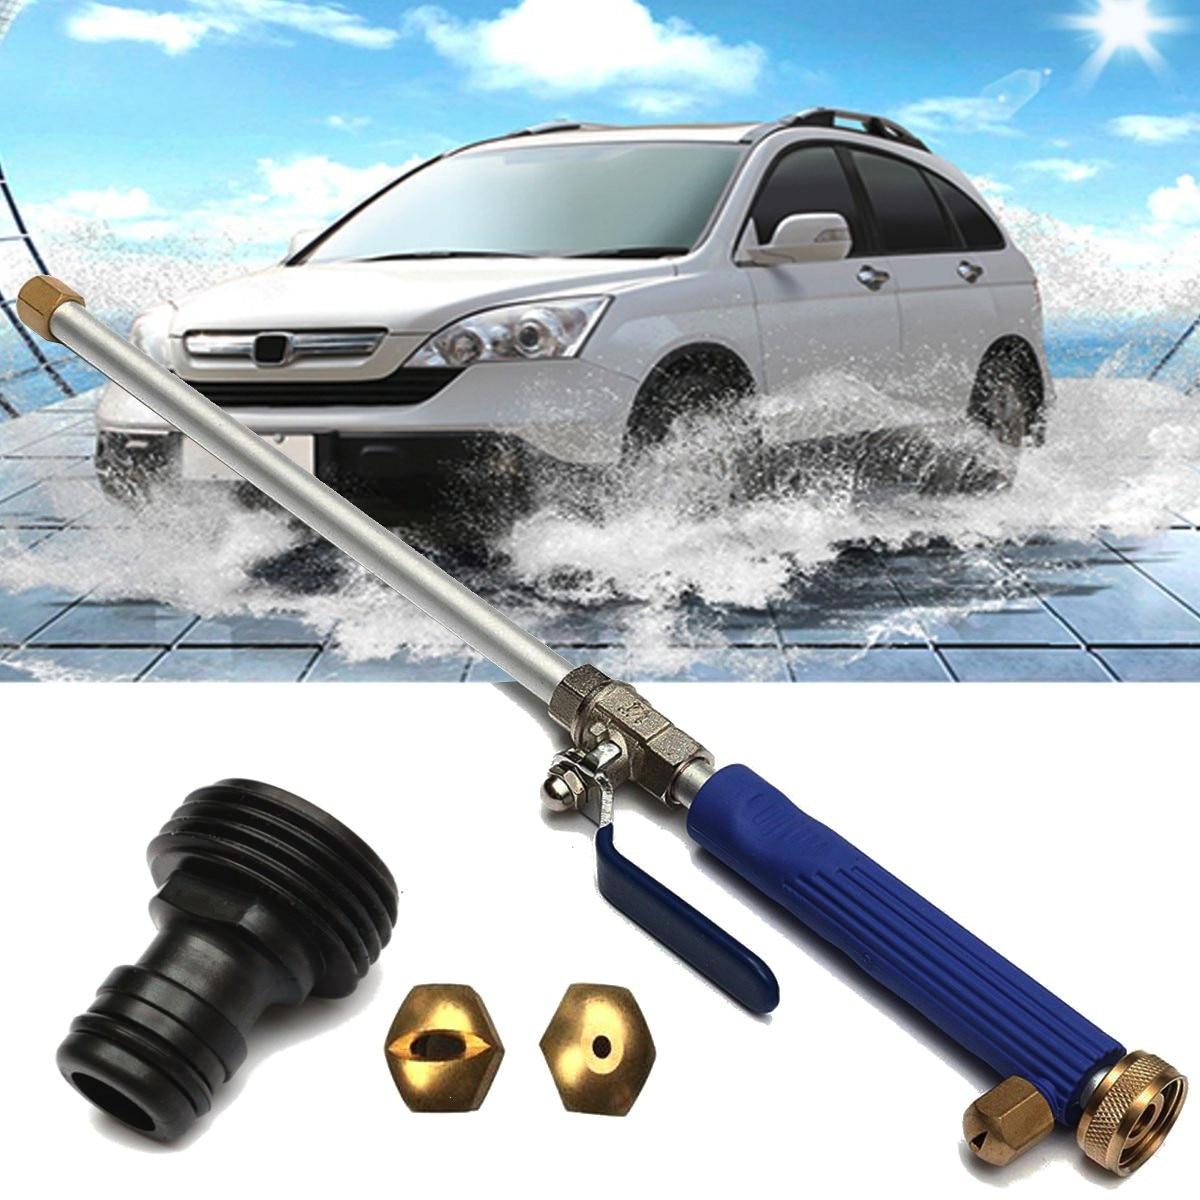 18 aluminio de alta presión de potencia para lavadora de coches boquilla de pulverización pistola de agua manguera de fijación con puntas